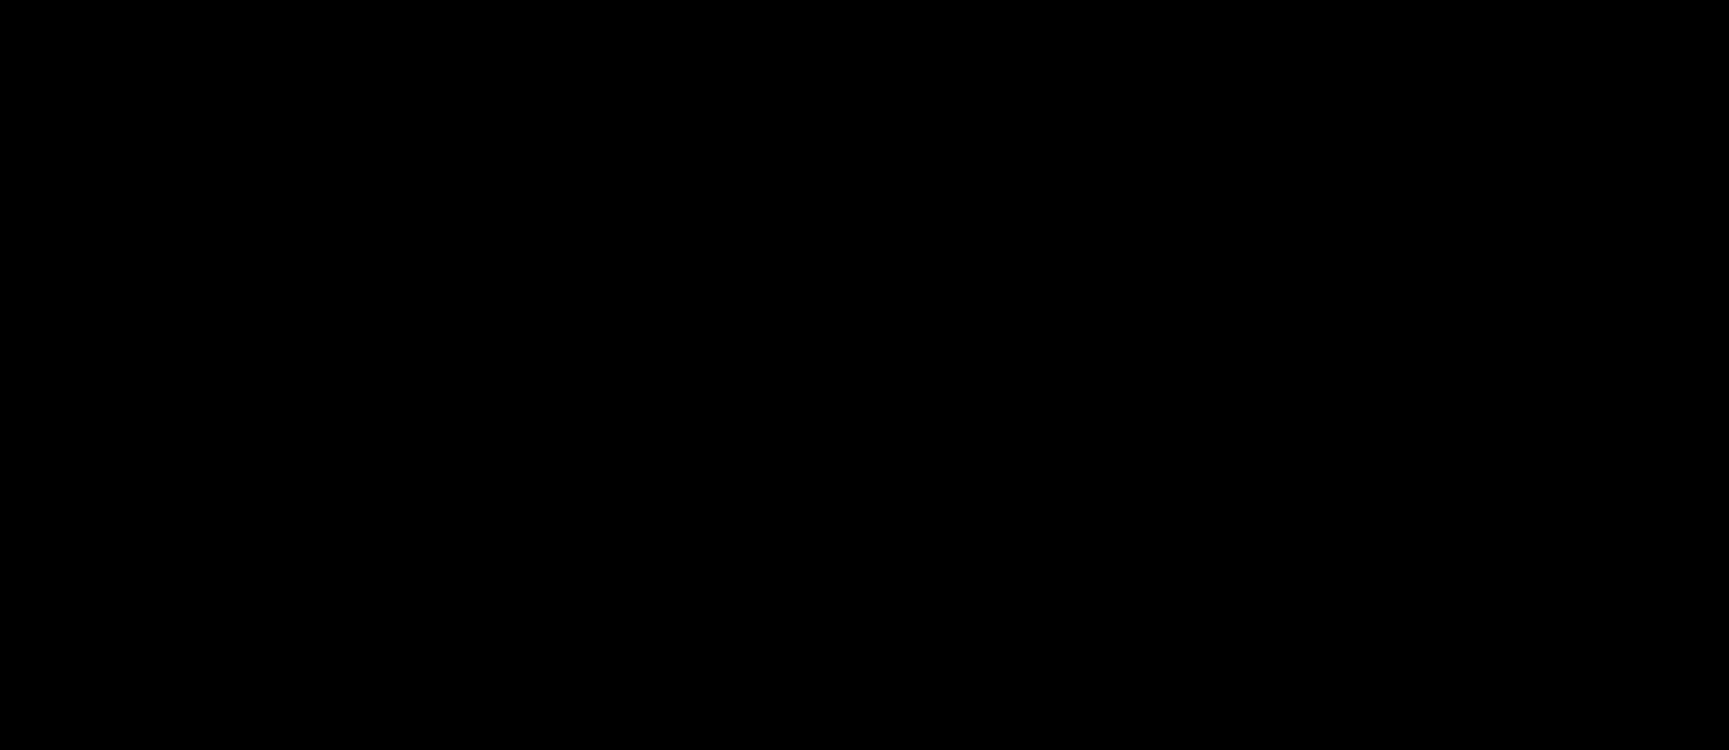 Unique Cricket Insect Clip Art Black And White File Free.